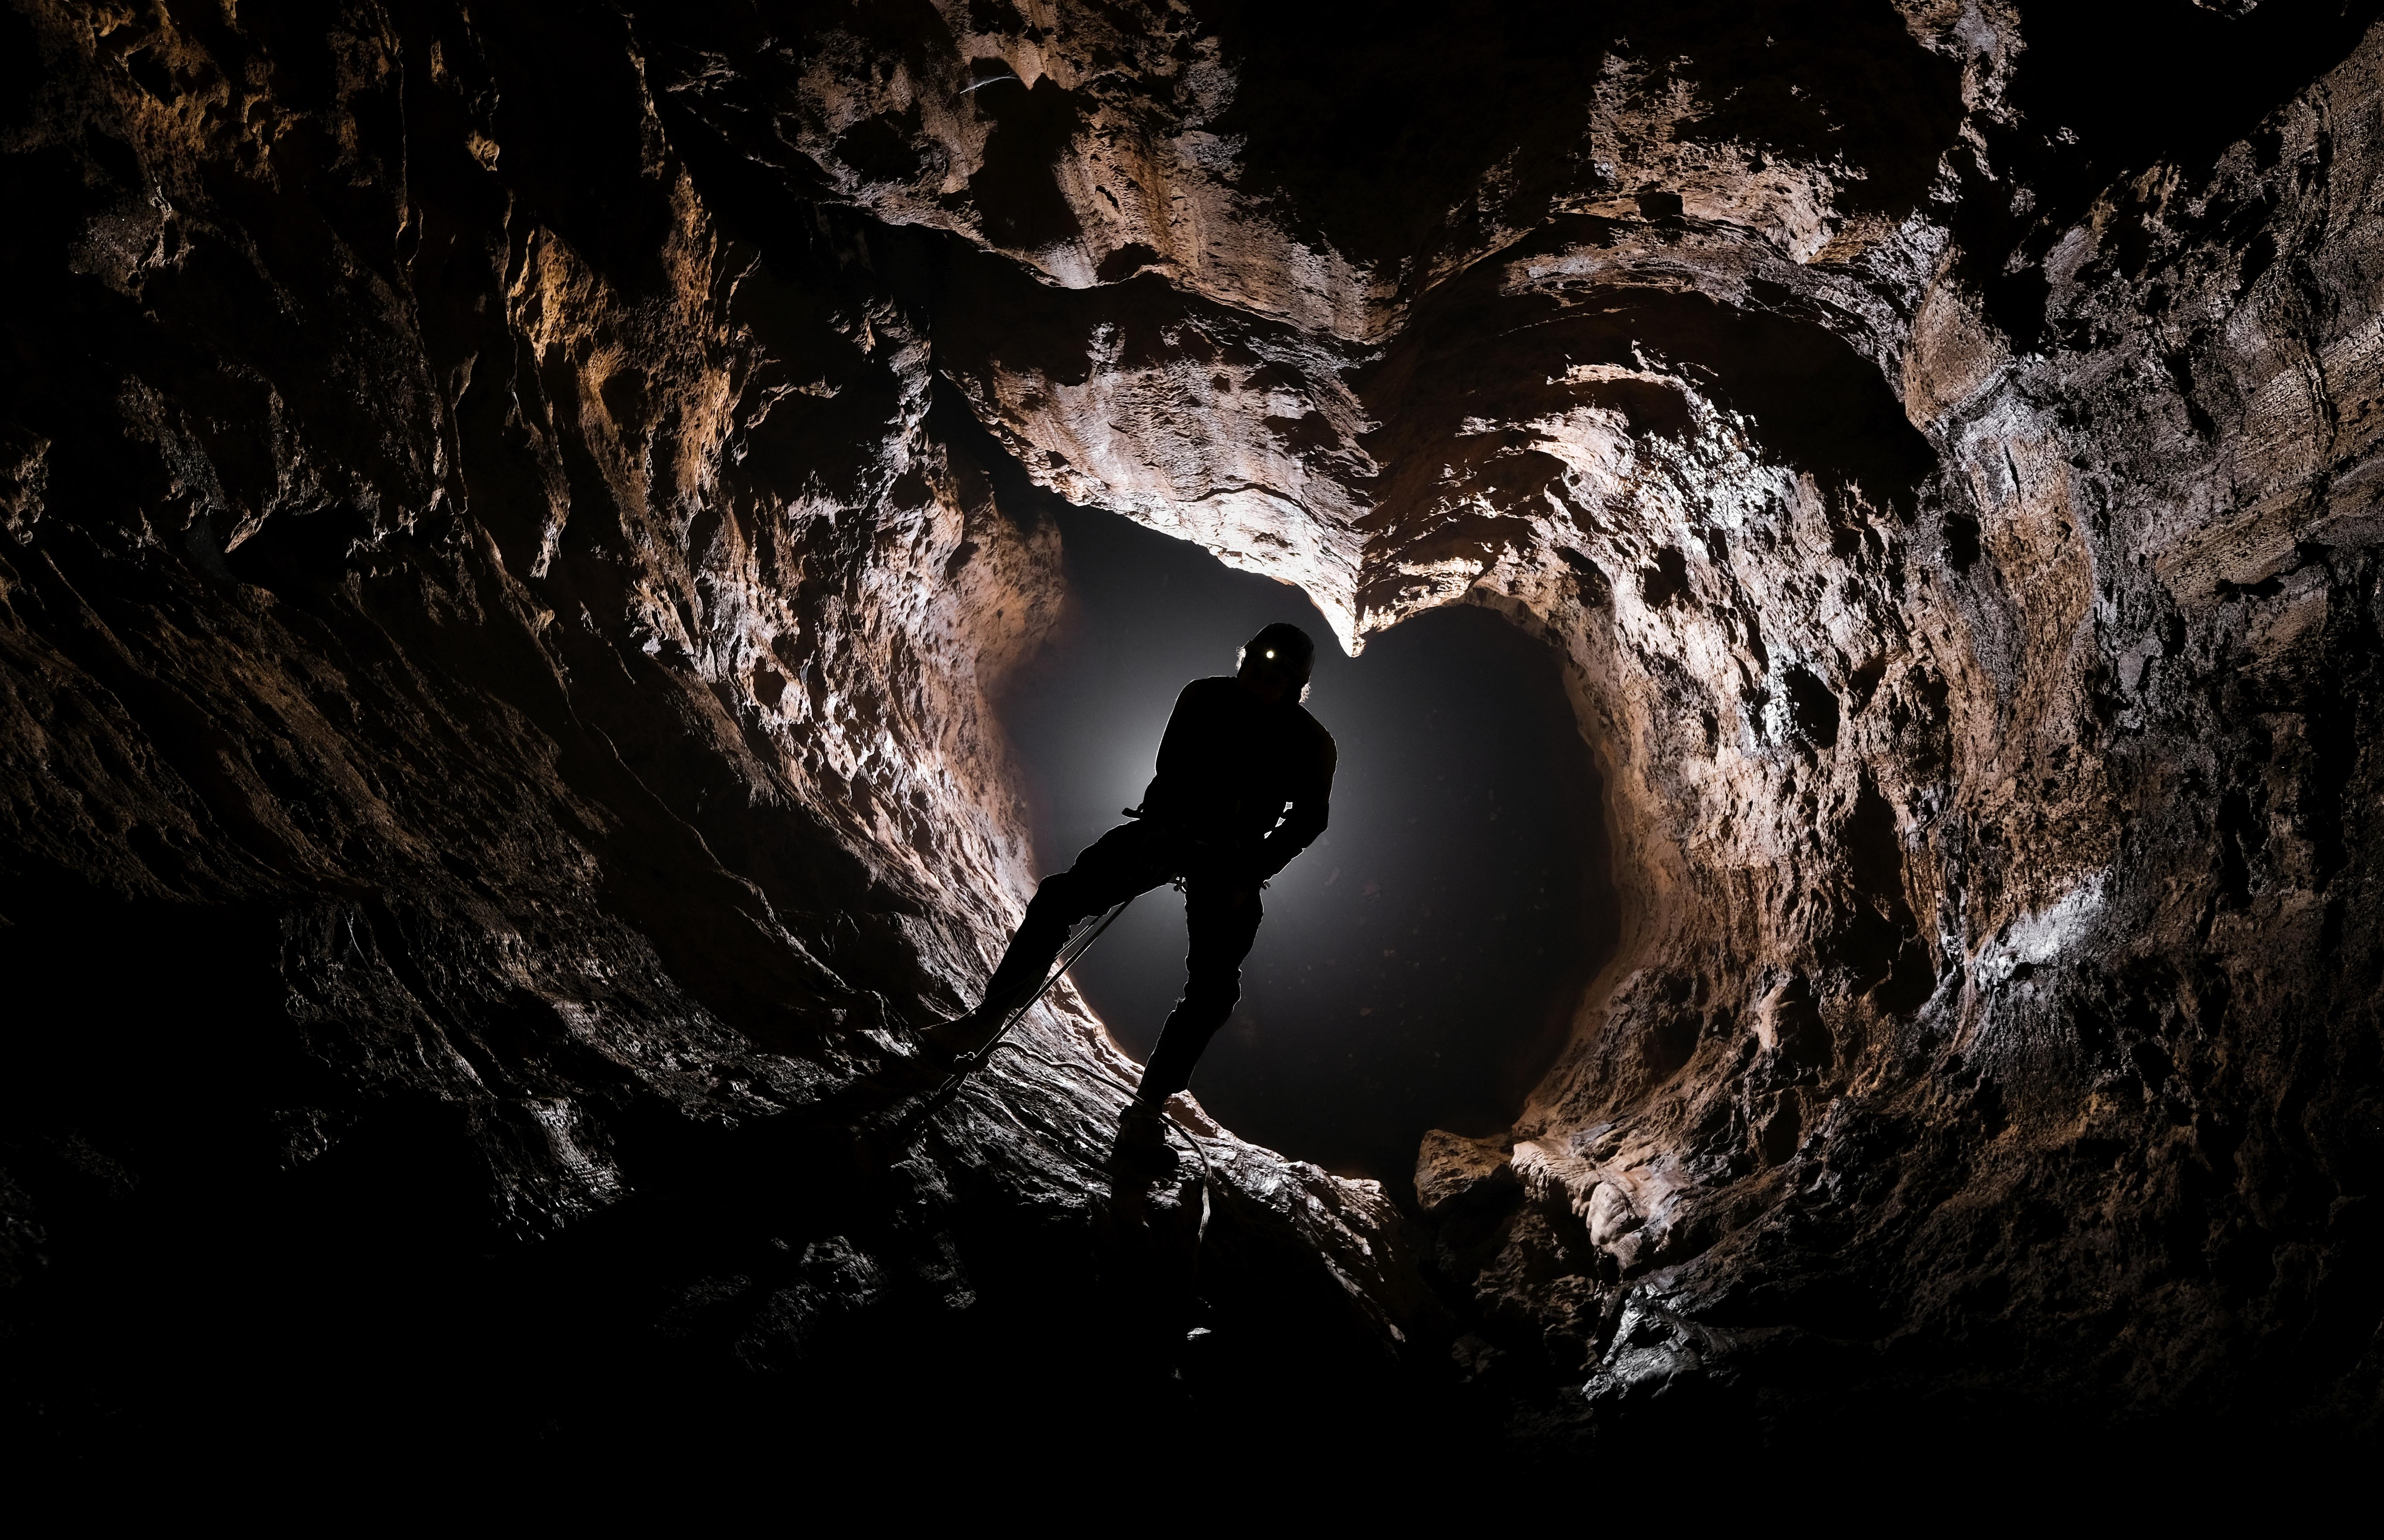 Cave photo contest 003